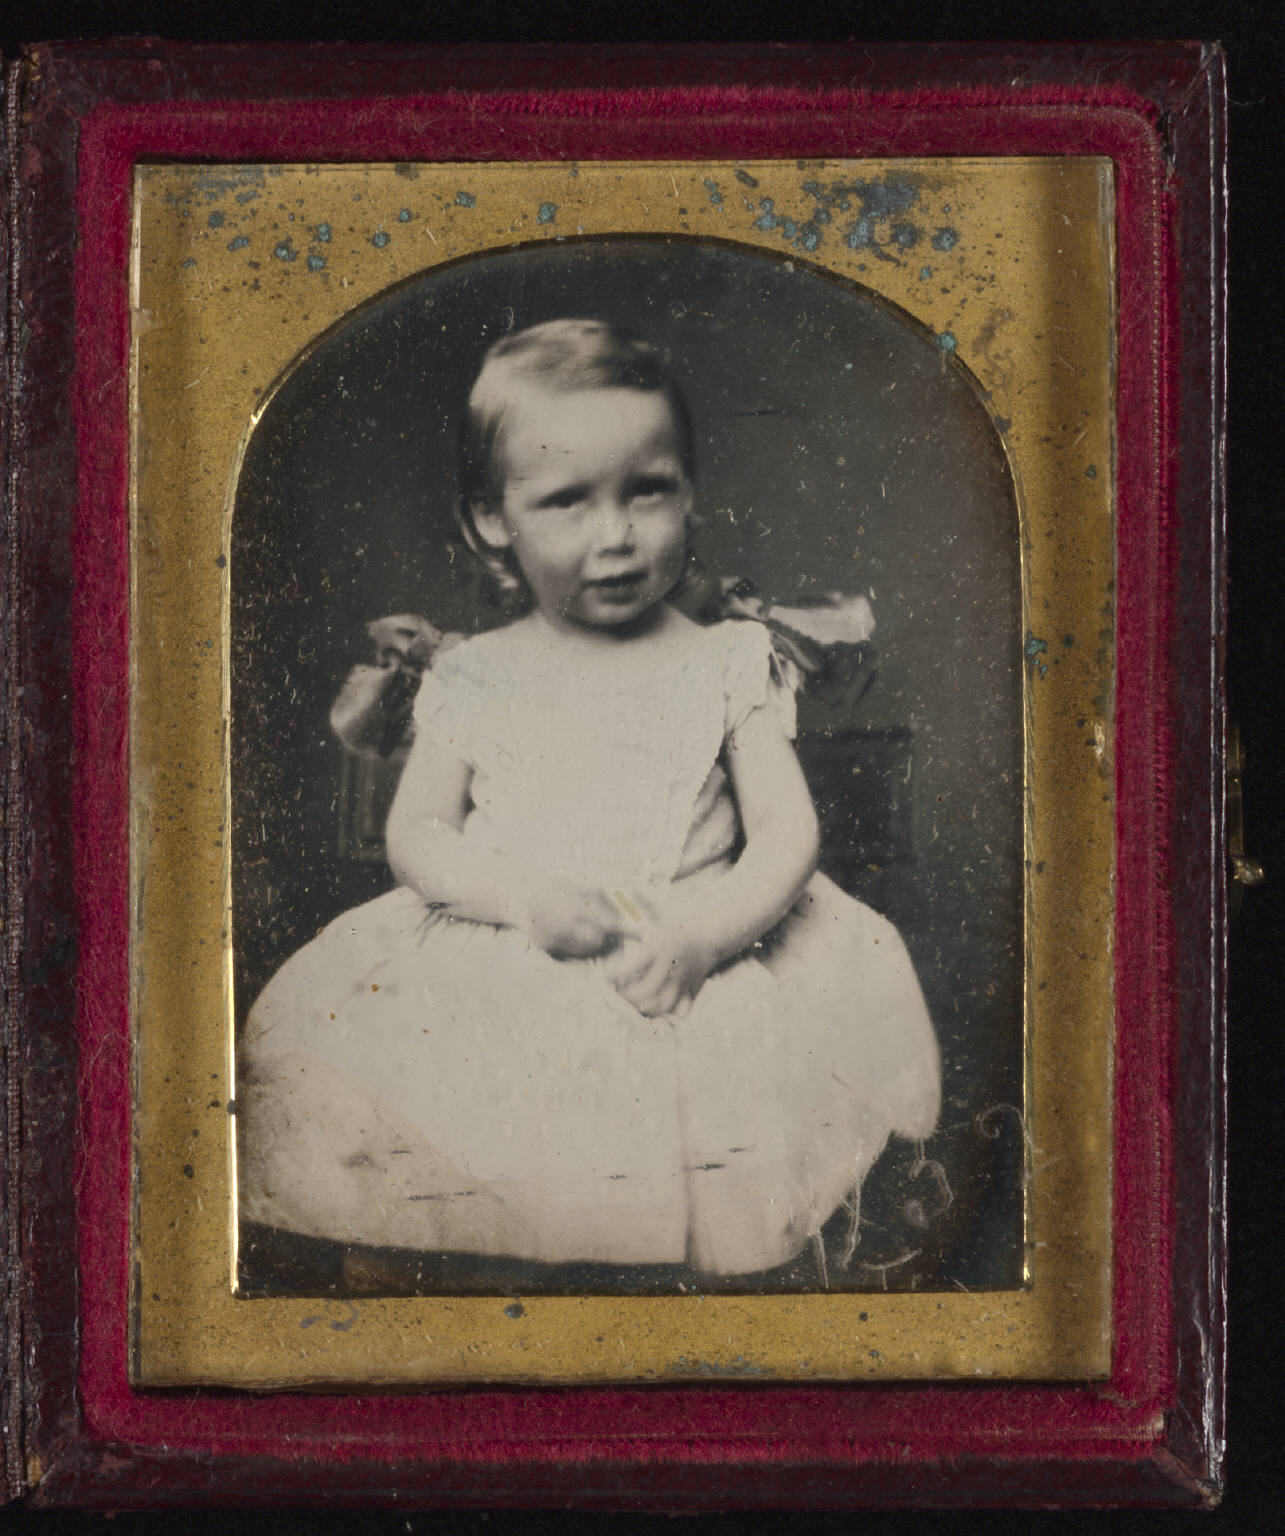 [Image: Robert_Louis_Stevenson_daguerreotype_por..._child.jpg]